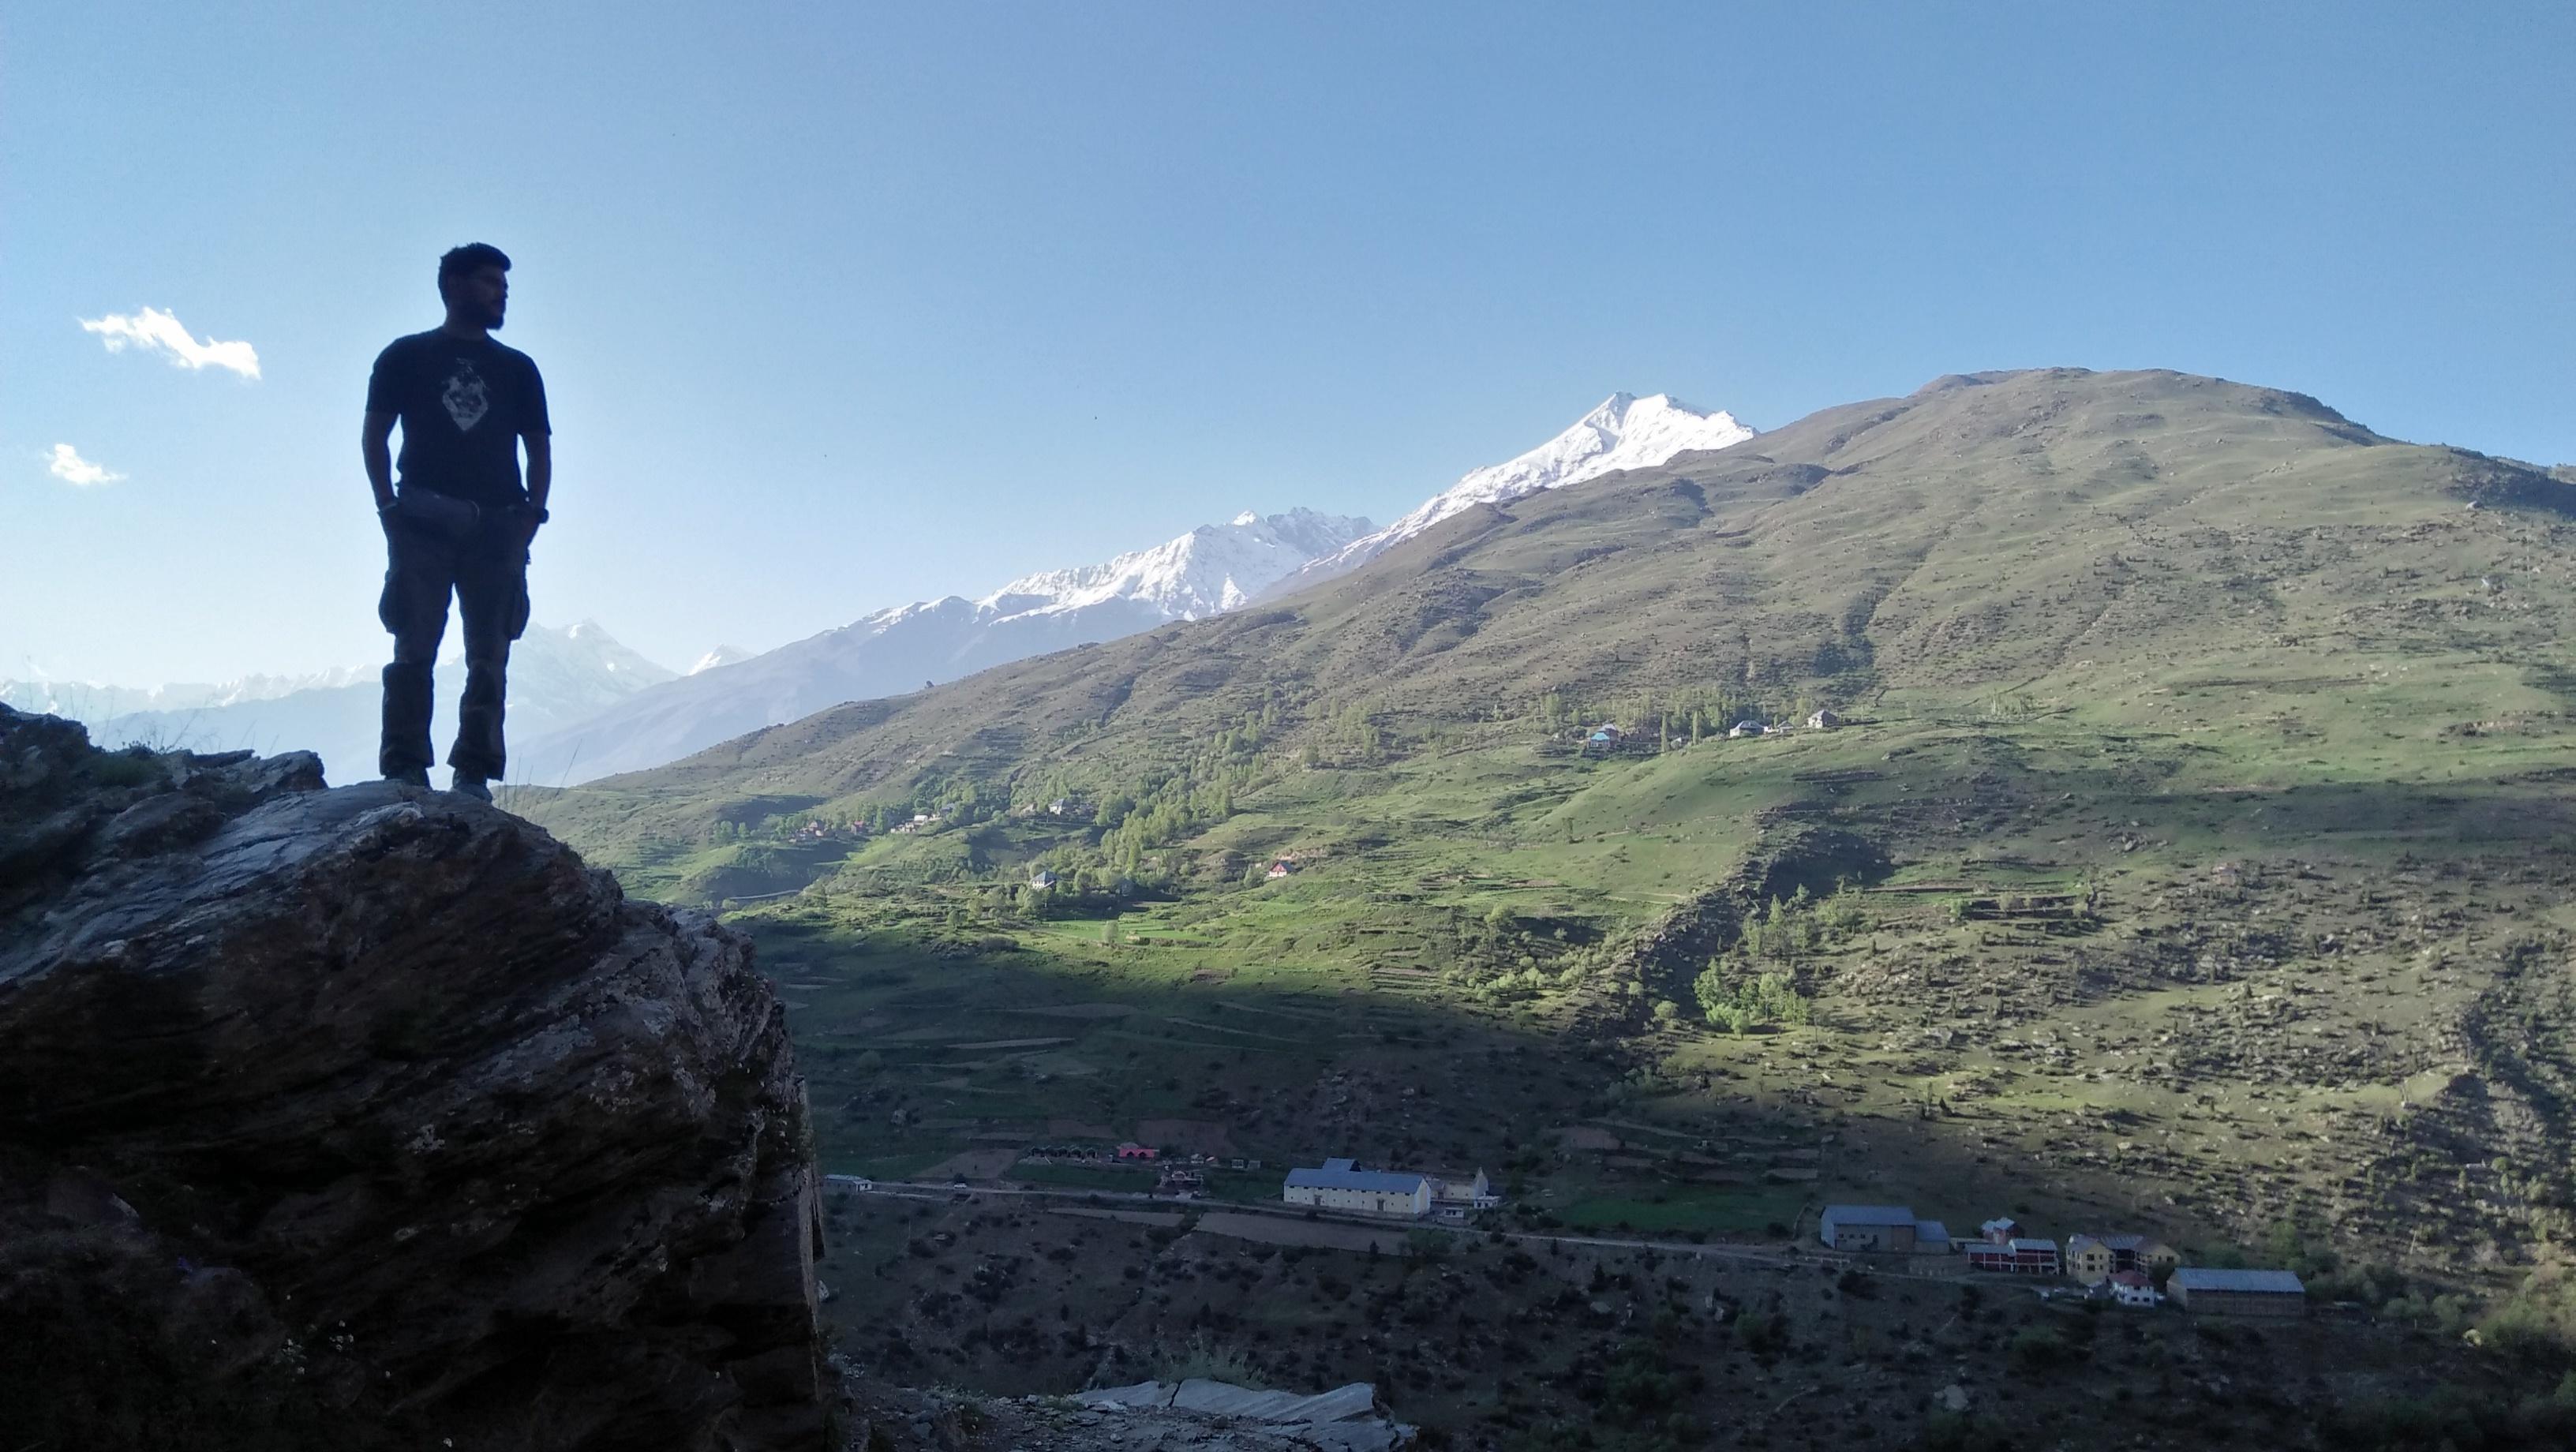 Gokul Bhandari - Why go Solo-Backpacking?